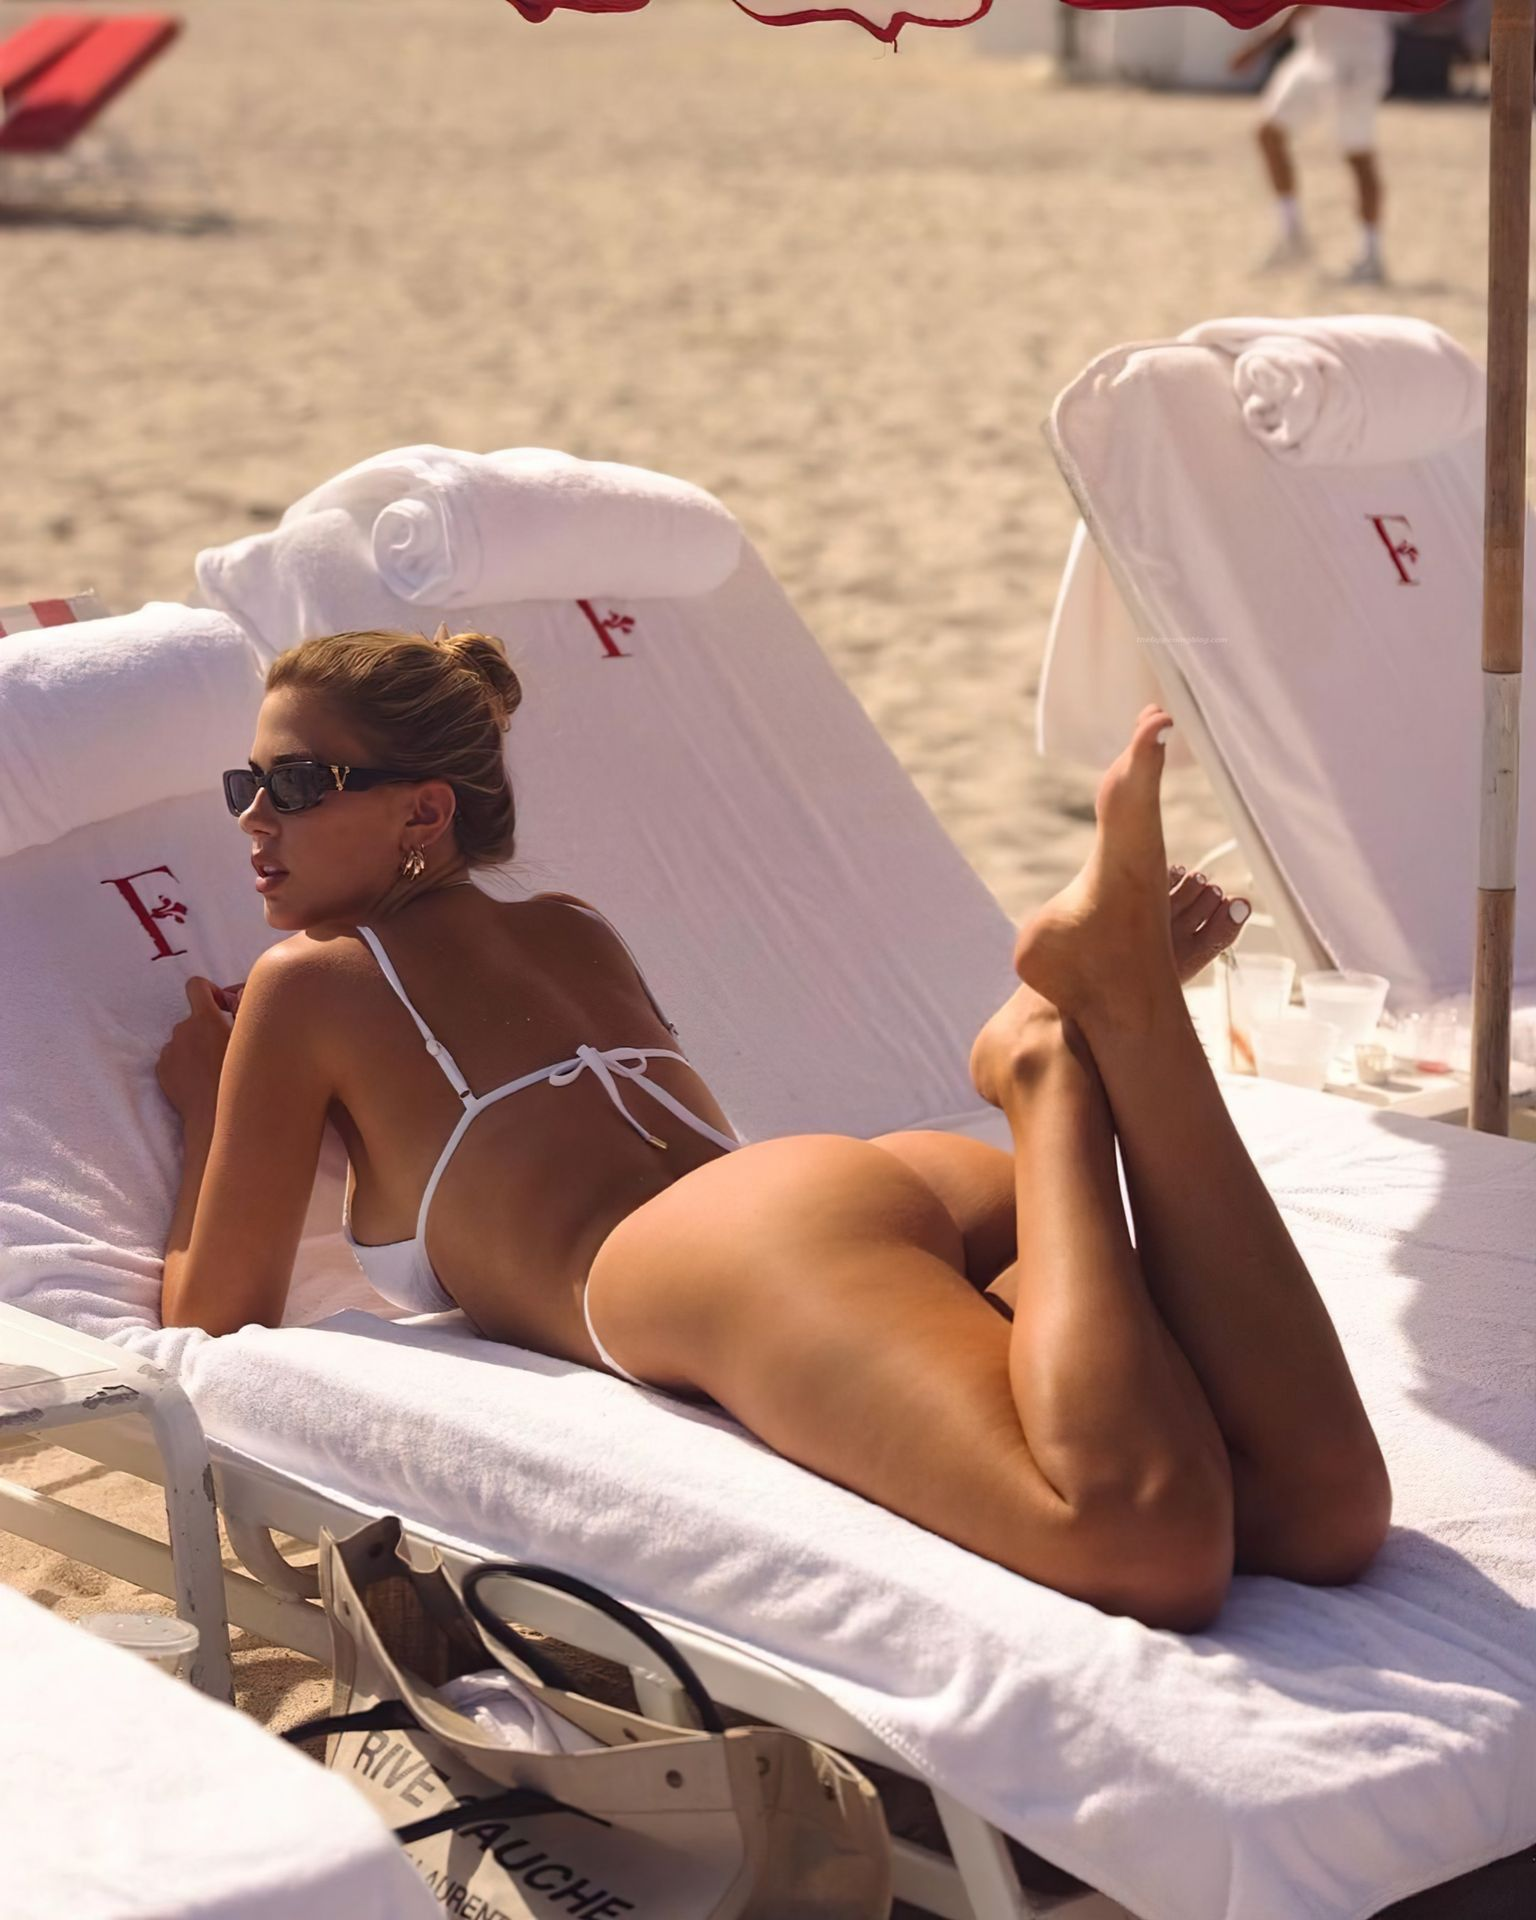 Kara-Del-Toro-Boobs-in-Bikini-2-1-thefappeningblog.com_.jpg